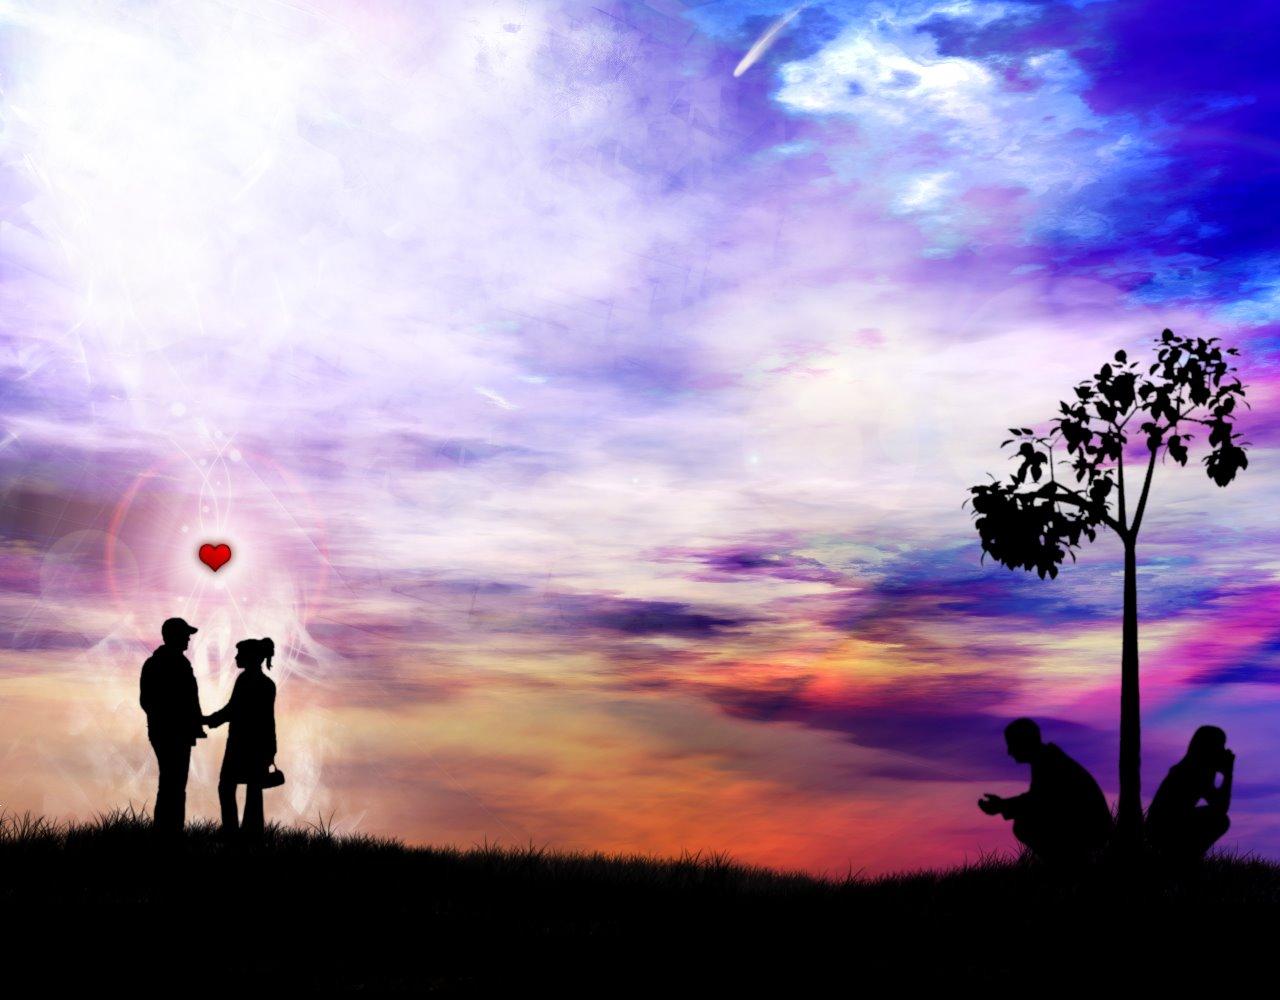 Sad Love Wallpaper Free Download 1 Hd Wallpaper: Wallpaper: Hd Wallpaper Sad Love